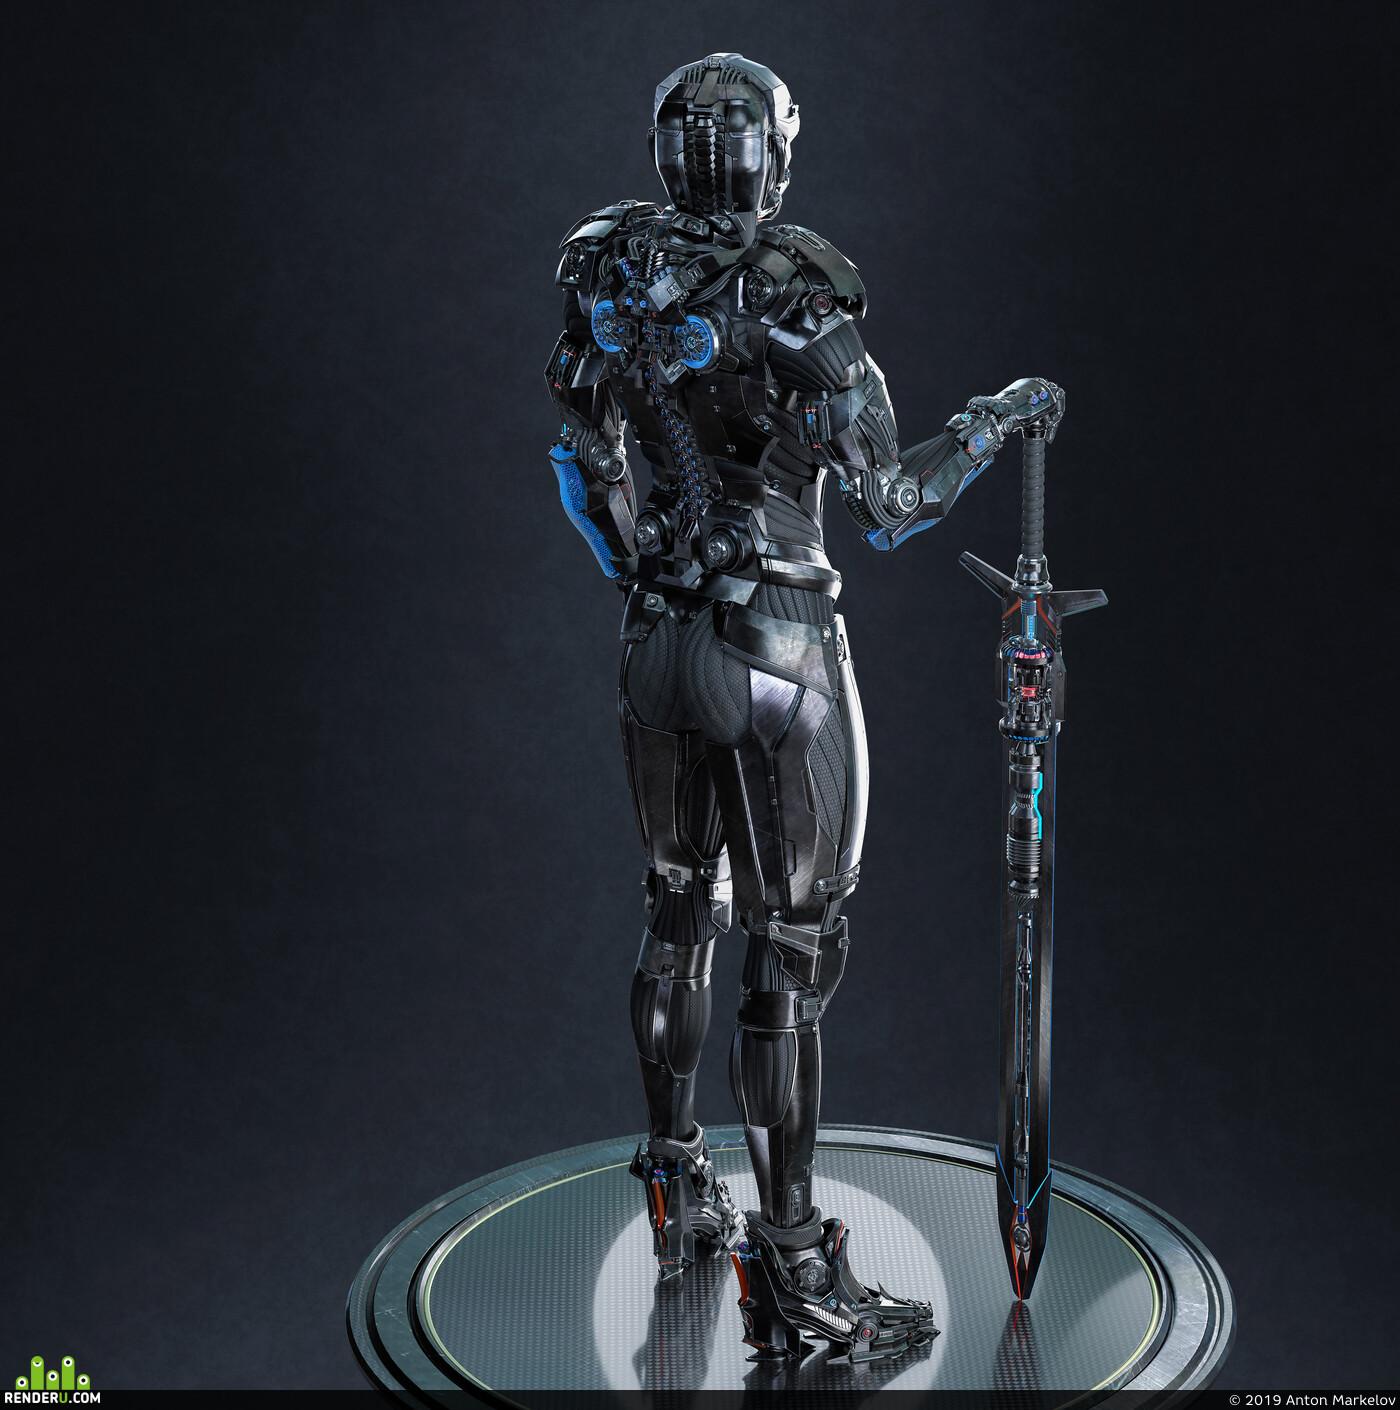 sci-fi armor, sci-fi, power armor, cyborg girl, cyborg, robot, elfgirl, high poly, polygonal modeling, character